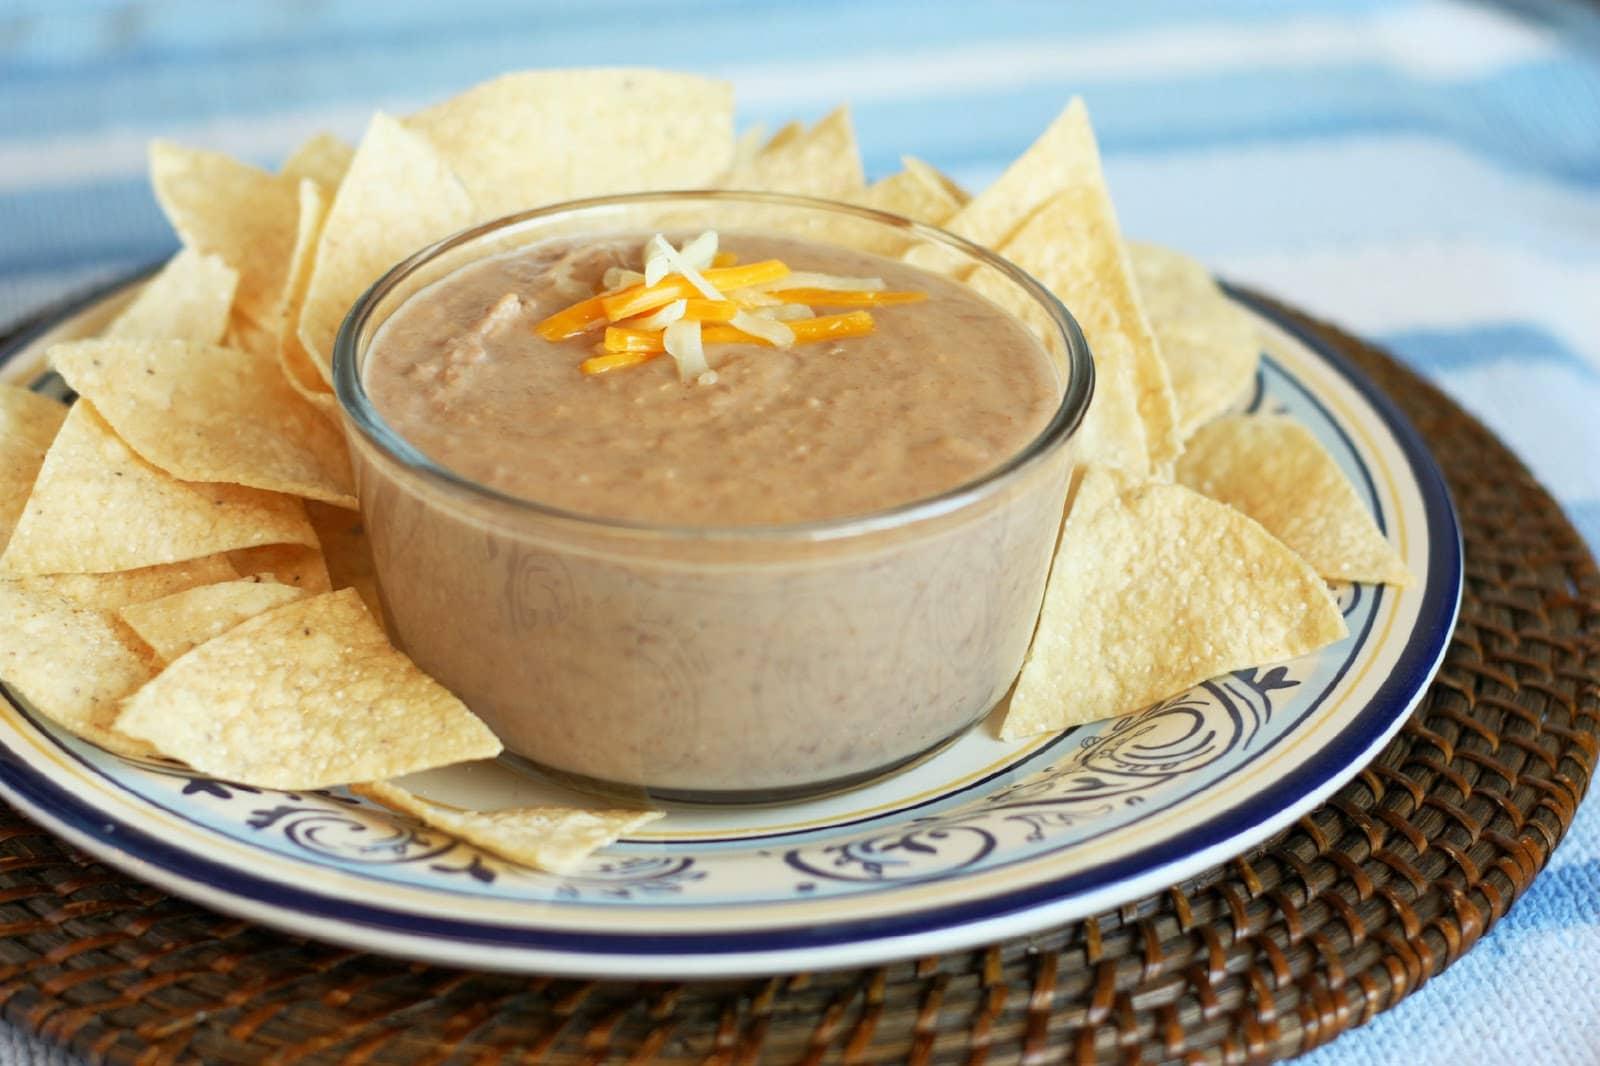 Easy refried bean dip recipes